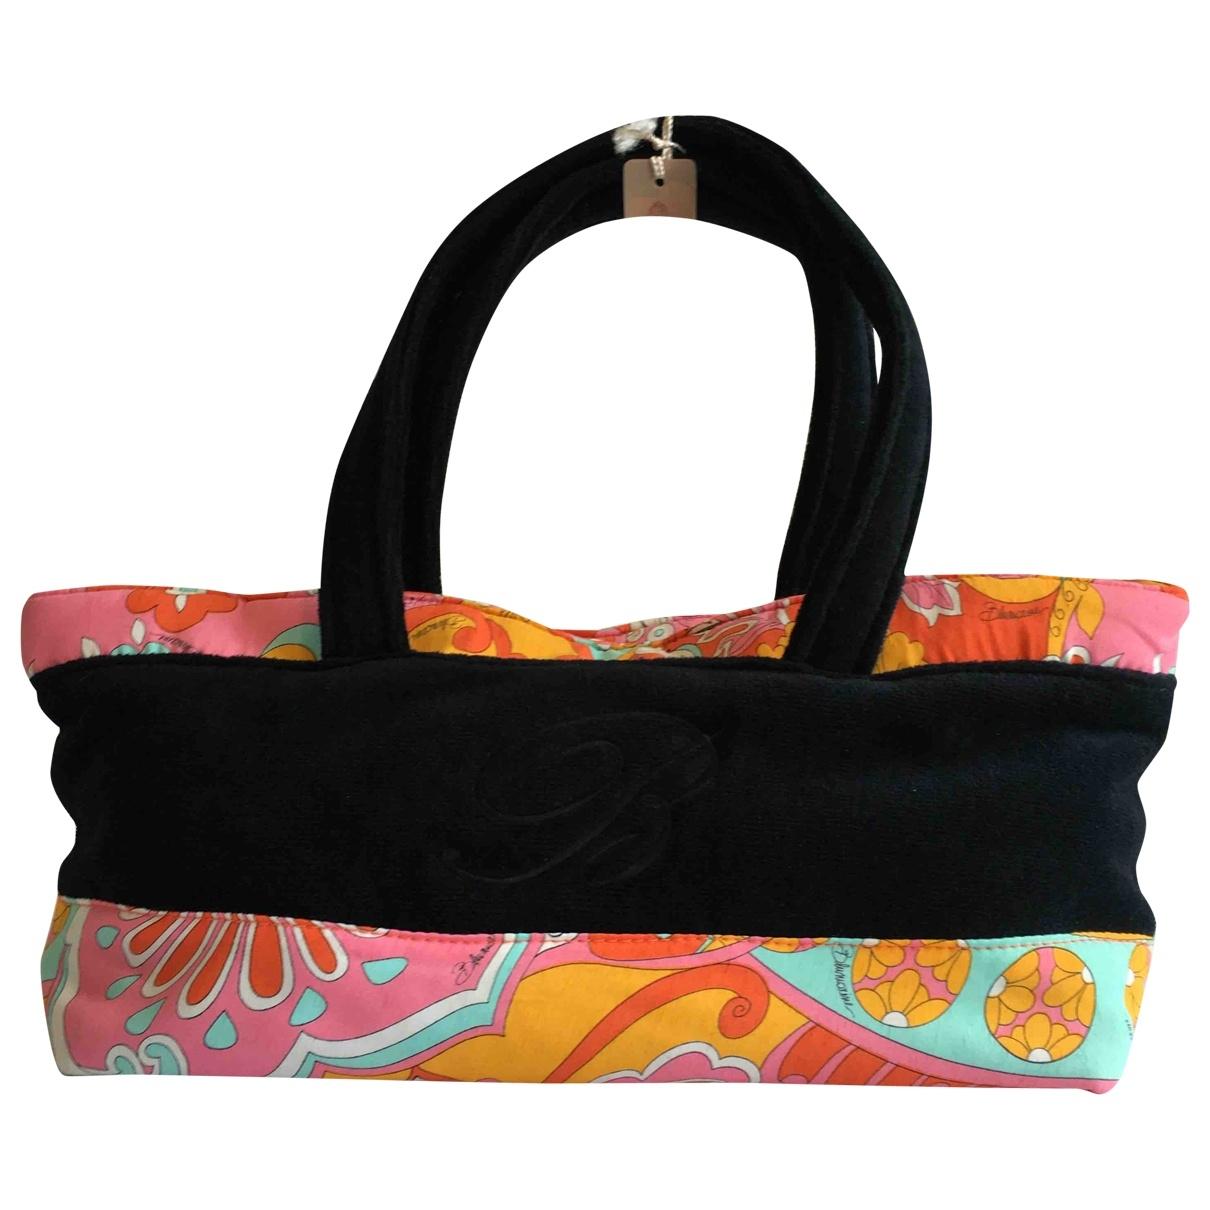 Blumarine \N Multicolour Cotton handbag for Women \N